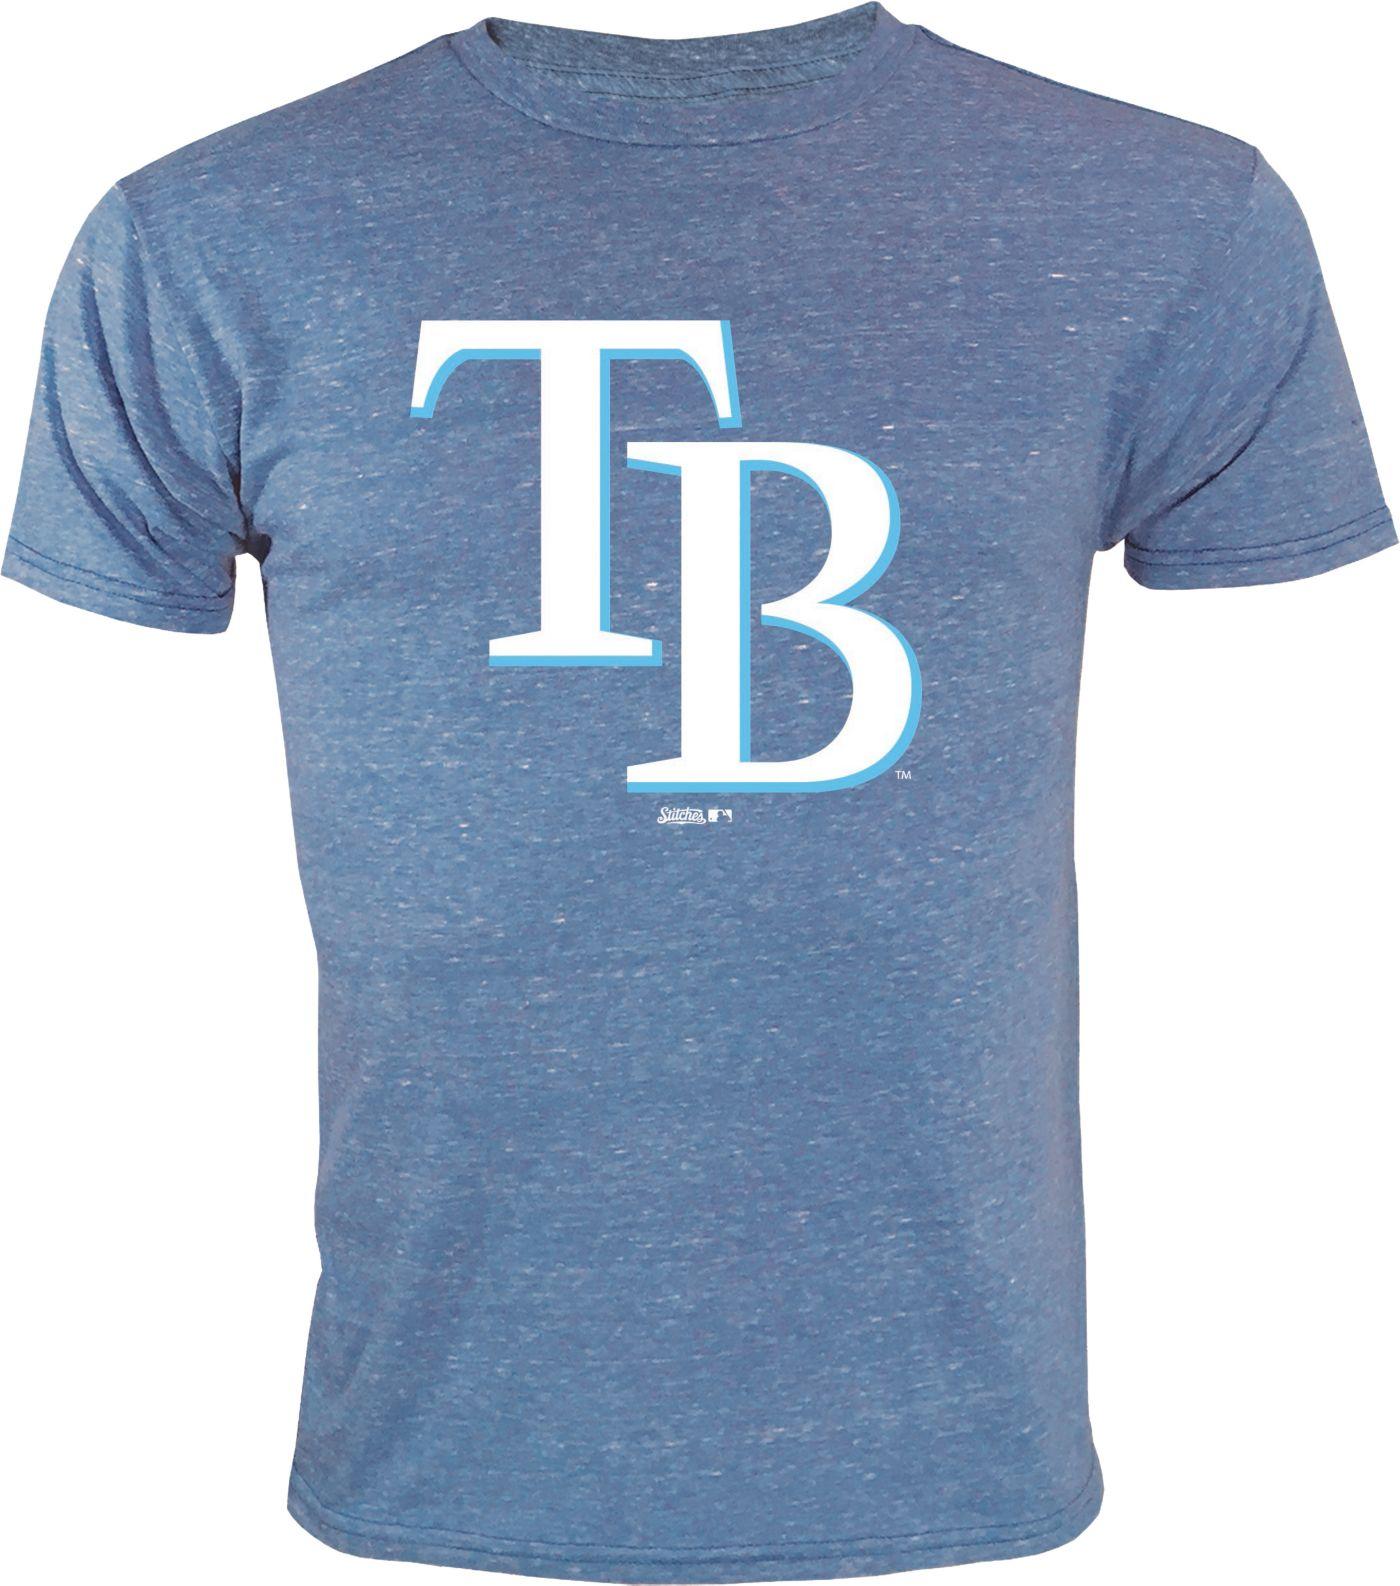 Stitches Youth Tampa Bay Rays T-Shirt